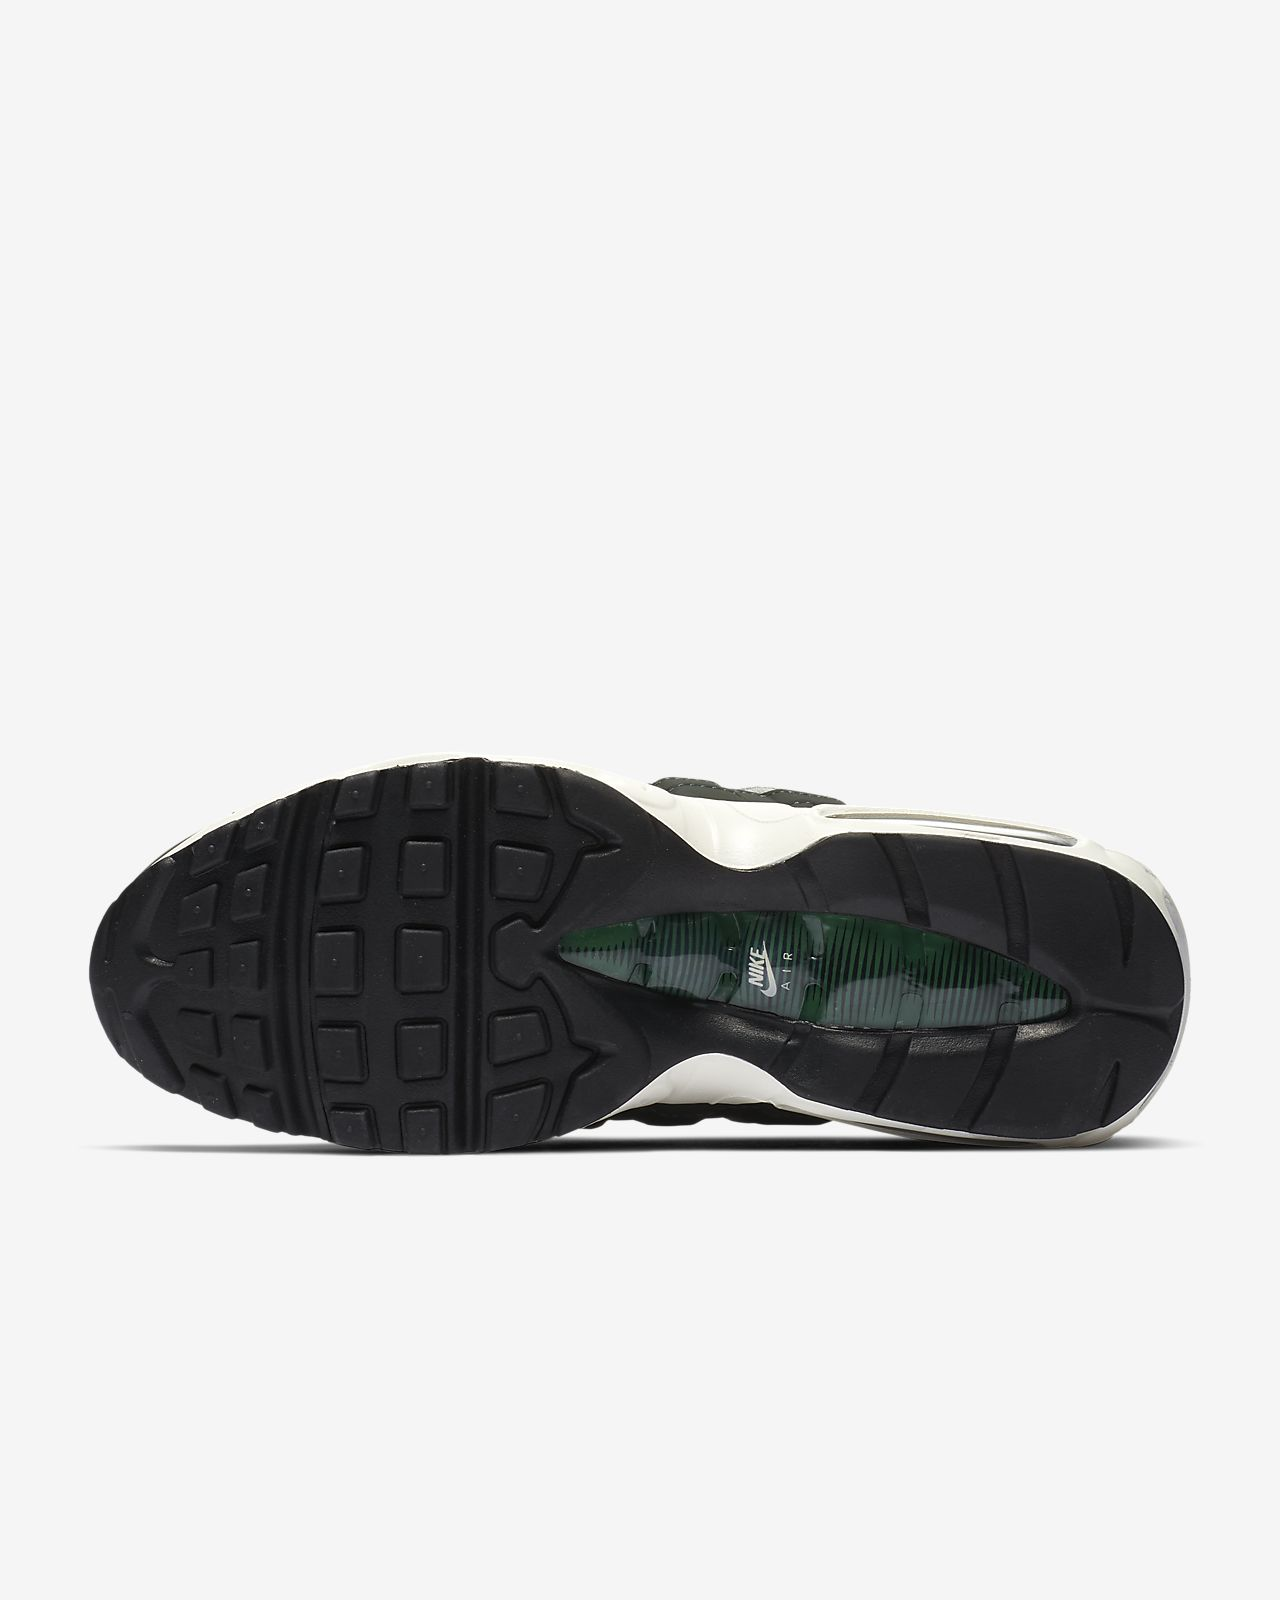 online retailer 576b3 a3666 ... Nike Air Max 95 Essential Men s Shoe